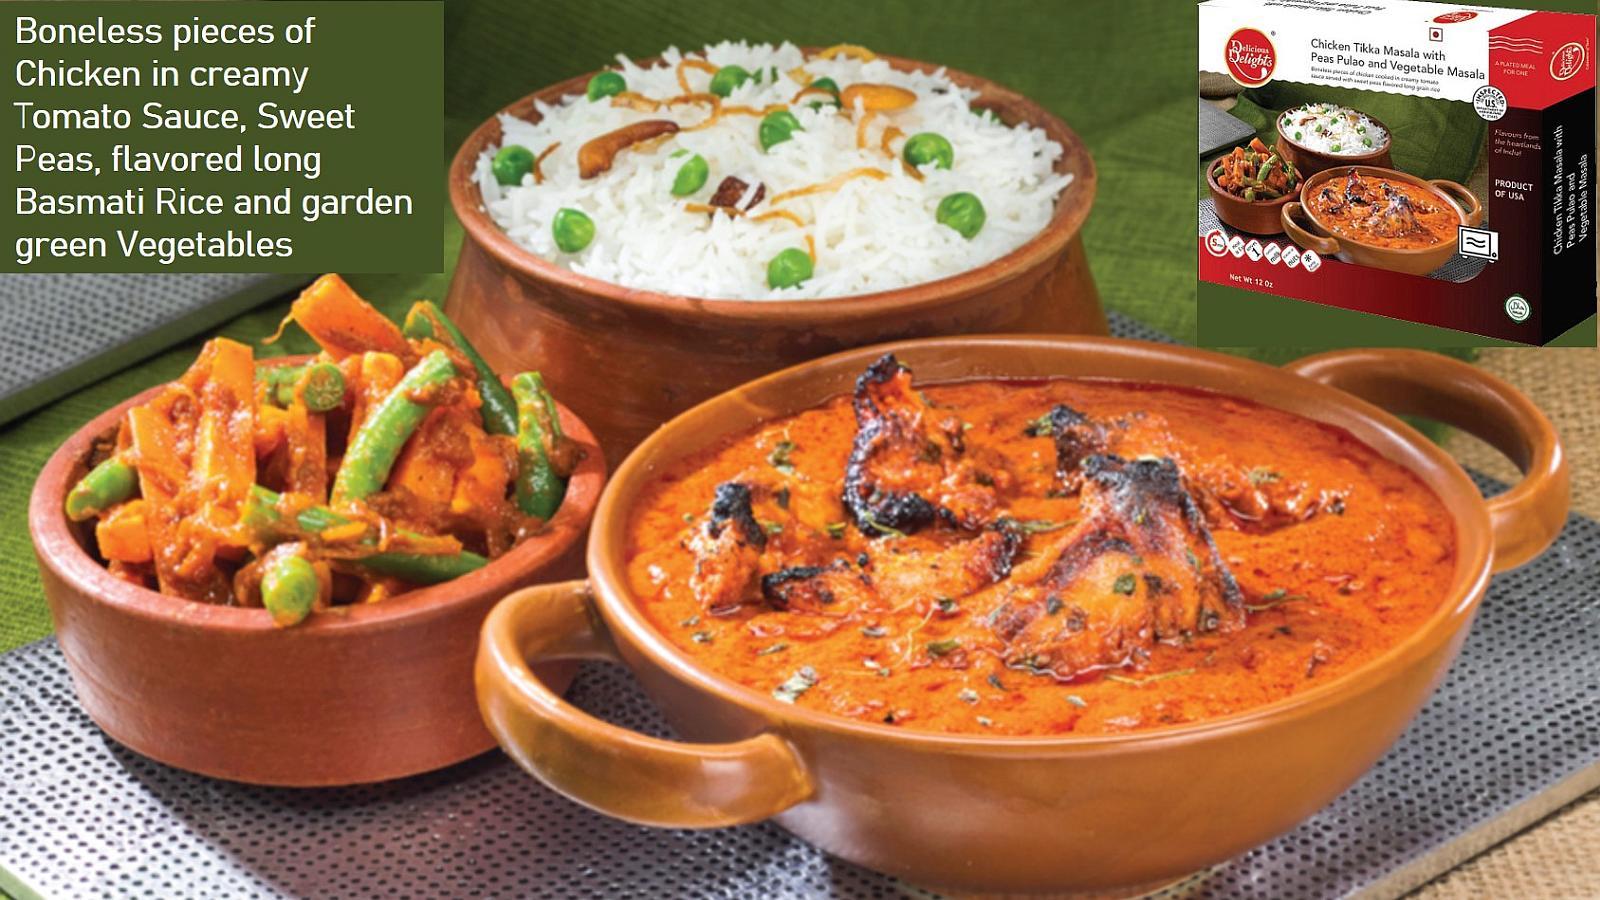 Basmati Peas Pulao - Chicken Tikka Masala - Vegetable Masala